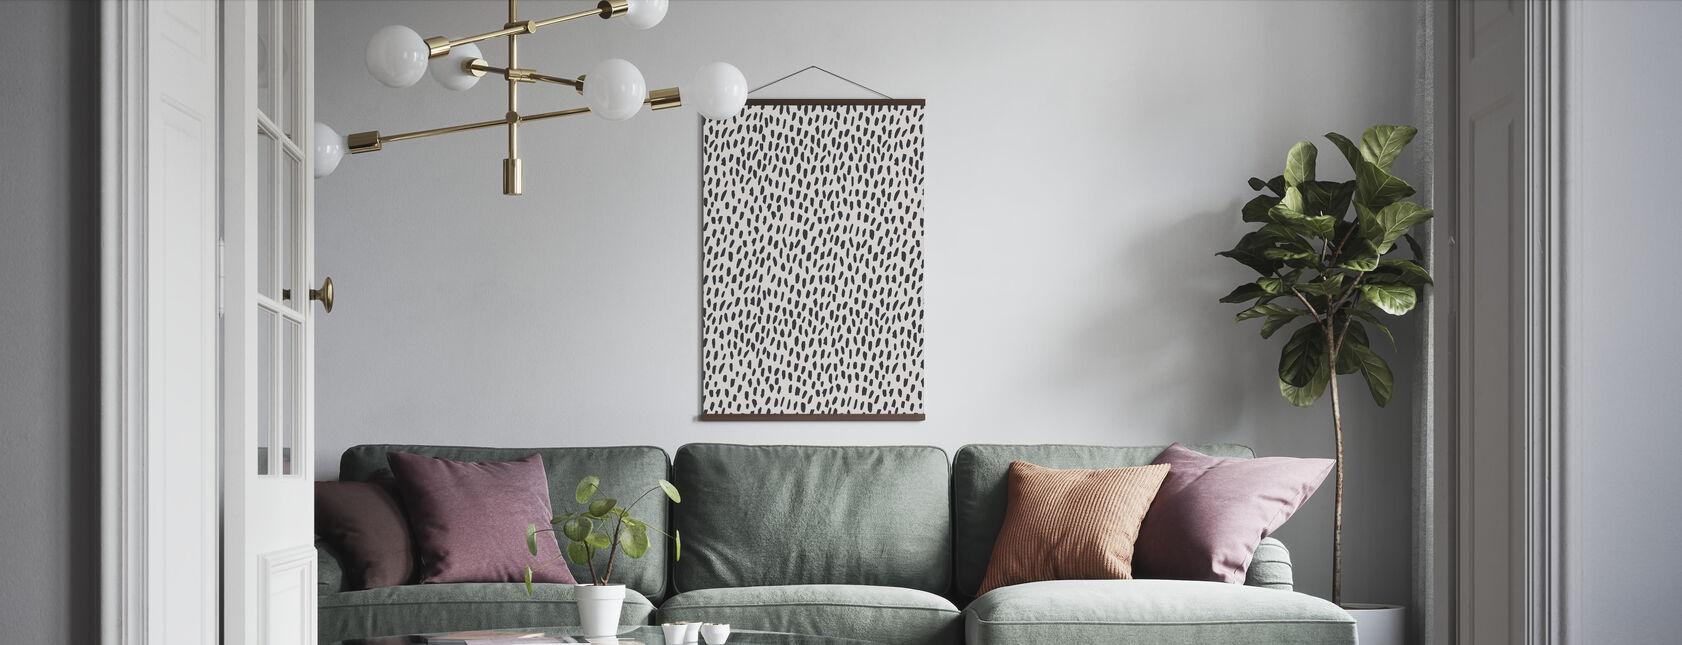 Zoute luipaard - Poster - Woonkamer